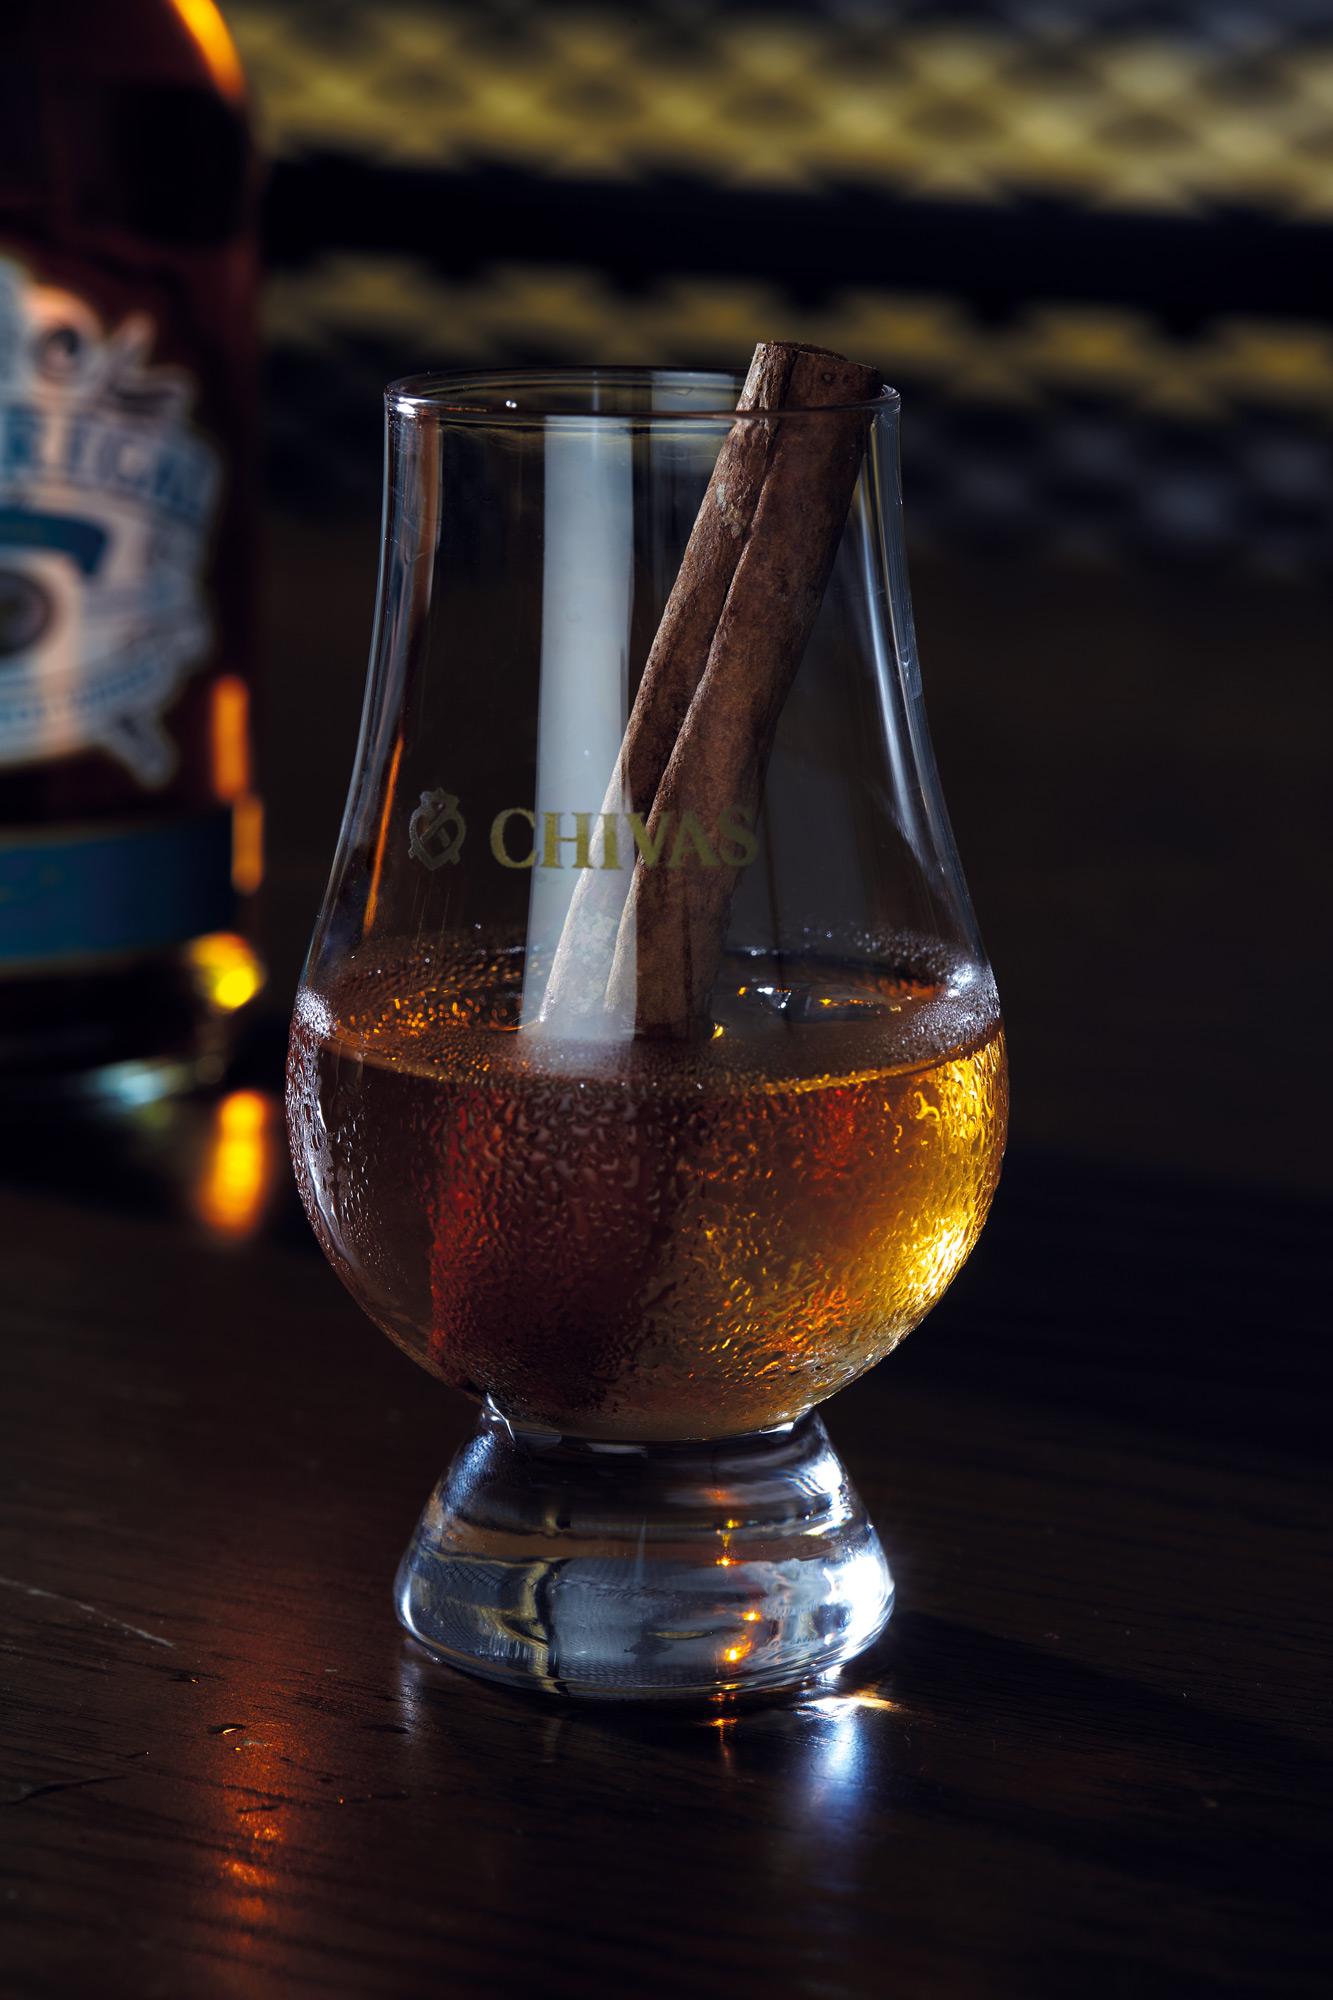 Effortless whisky-based DIY cocktails with Chivas – Part 3